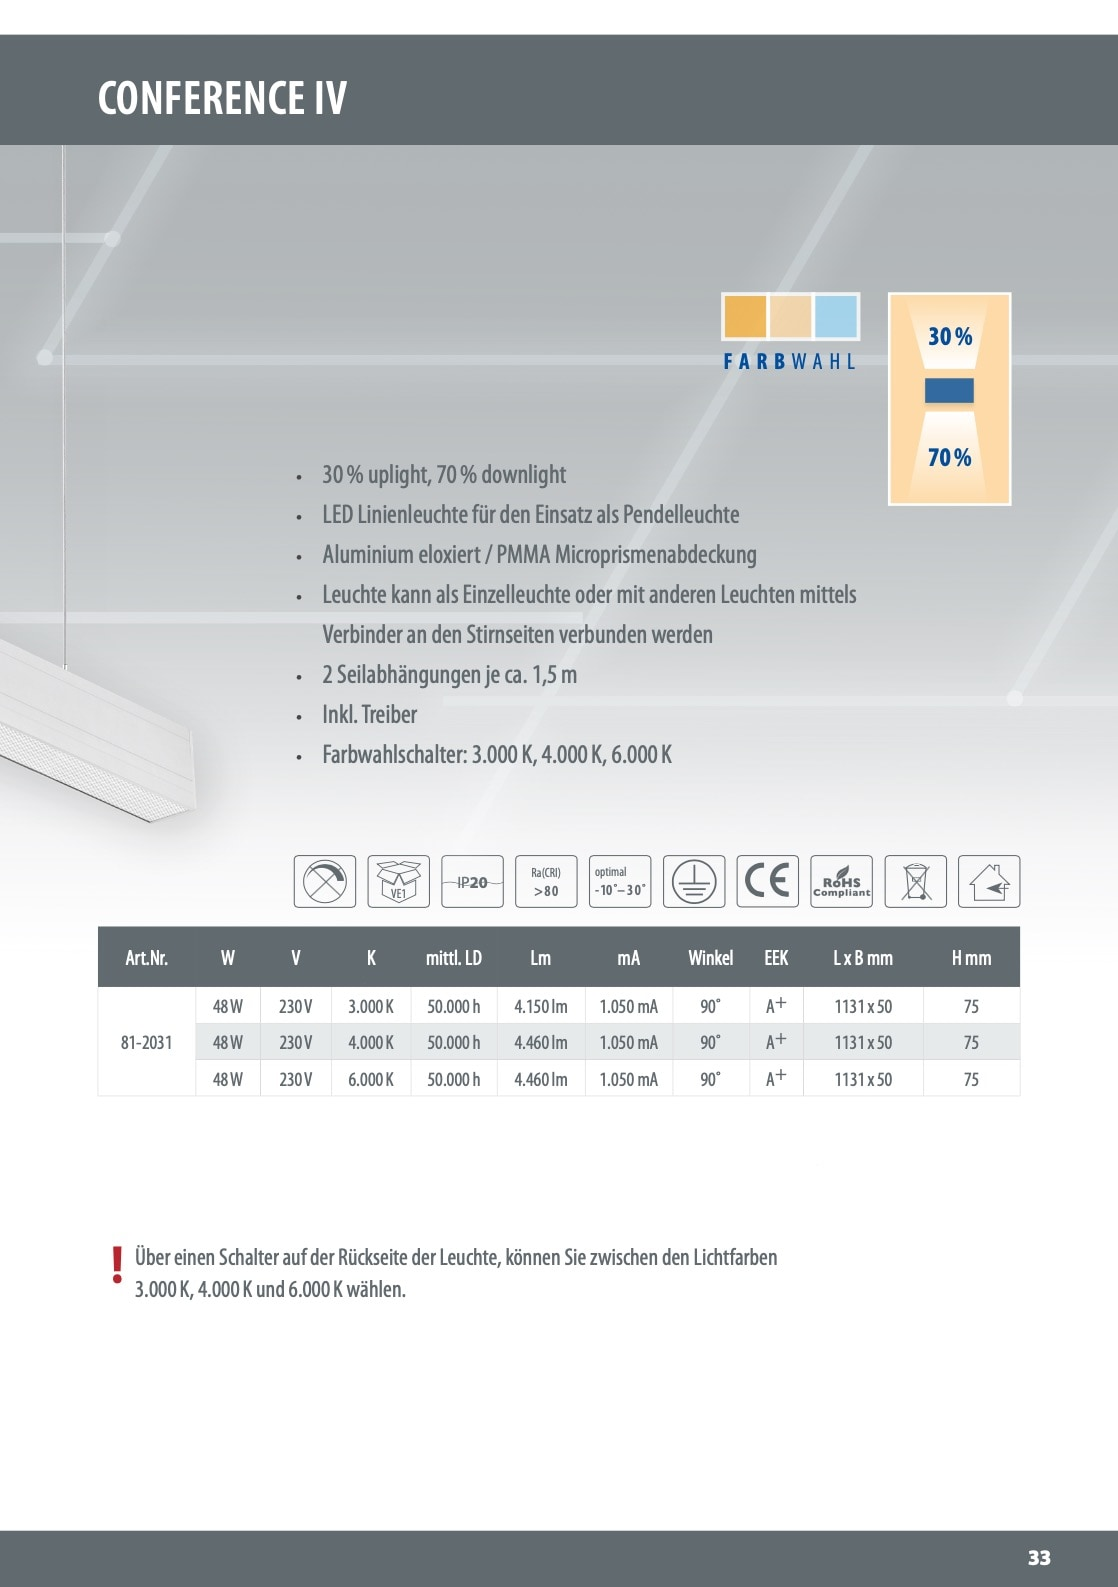 M-light LED-Pendelleuchte CONFERENCE up and down 48W,230V 3 Lichtfarben 3000/4000/6000 #81-2031